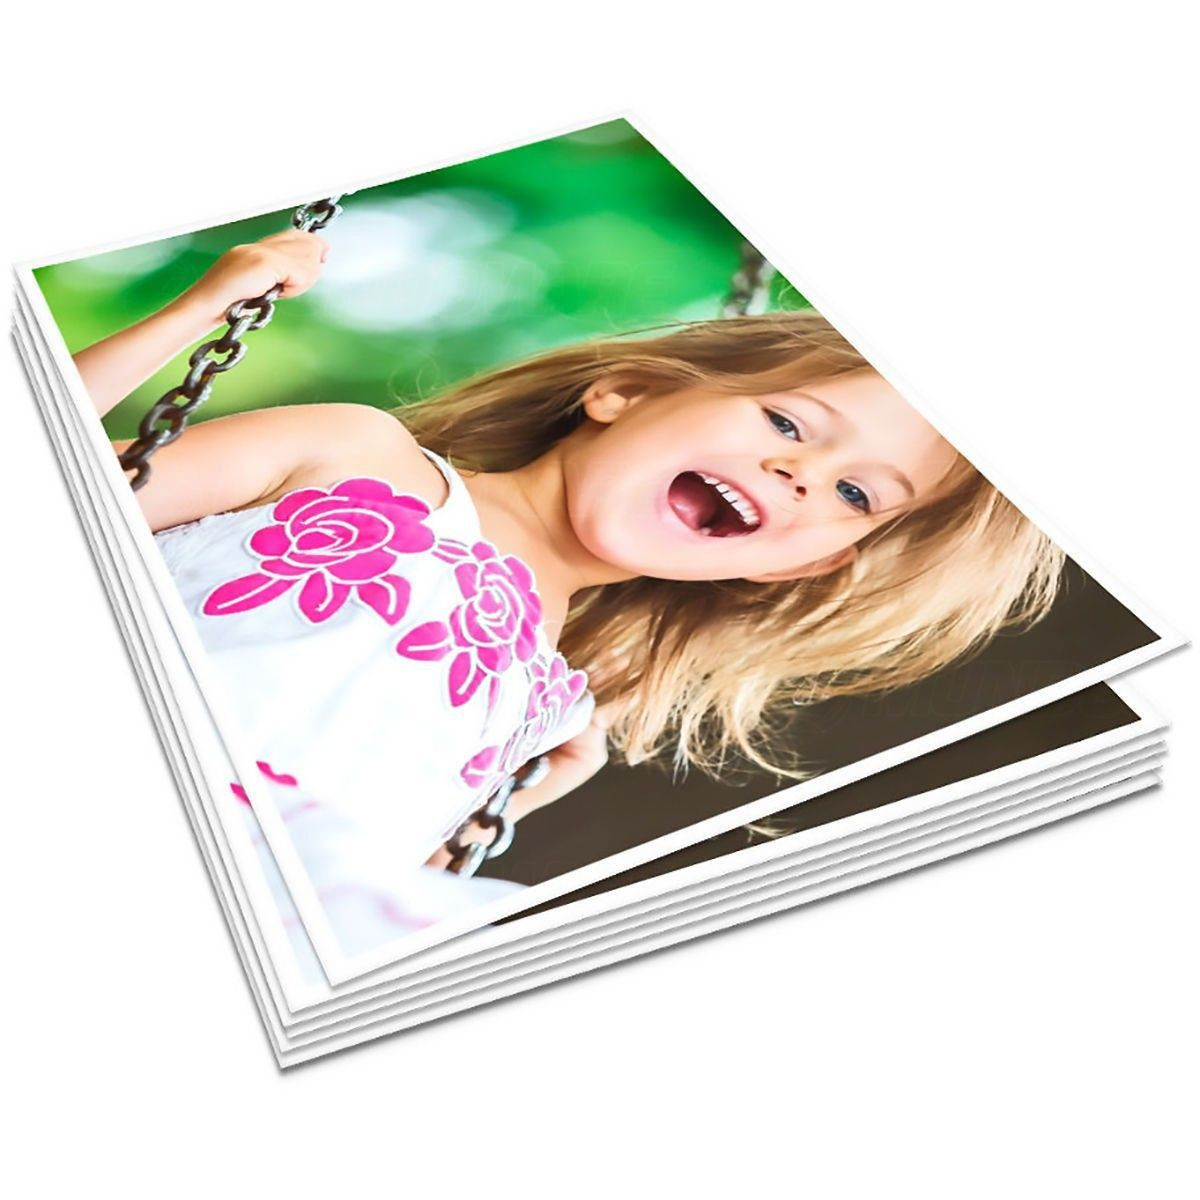 Papel Fotográfico Matte Fosco 108g A4 Branco Resistente à Água / 300 folhas